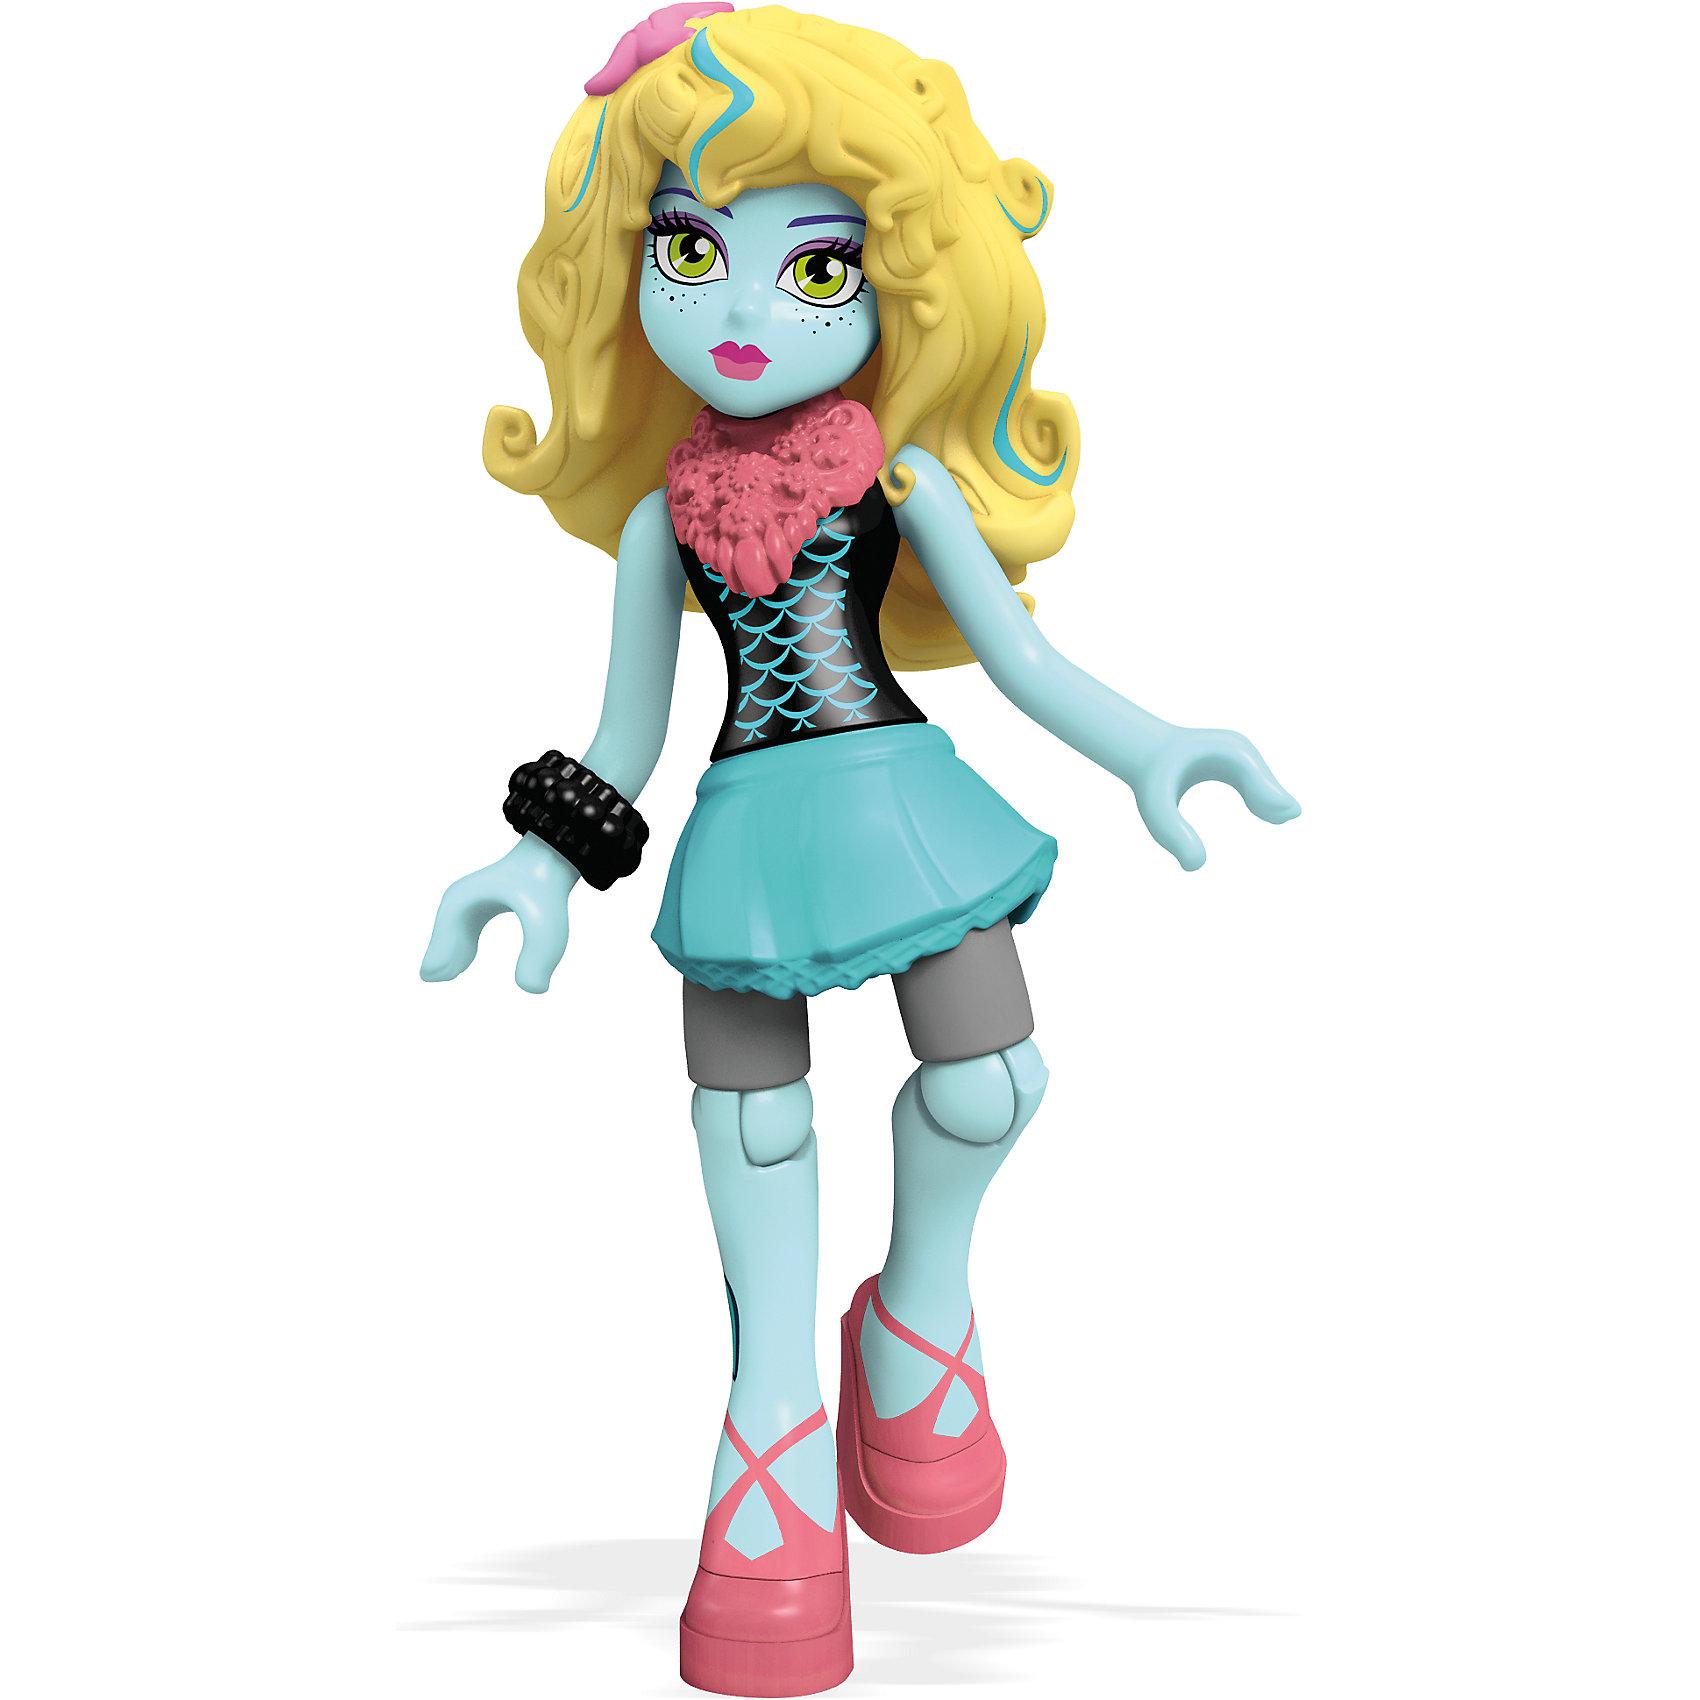 Мини-кукла Mega Bloks Monster High Лагуна Блю, 12,5 смМини-куклы<br><br><br>Ширина мм: 125<br>Глубина мм: 85<br>Высота мм: 25<br>Вес г: 17<br>Возраст от месяцев: 72<br>Возраст до месяцев: 144<br>Пол: Женский<br>Возраст: Детский<br>SKU: 5559840